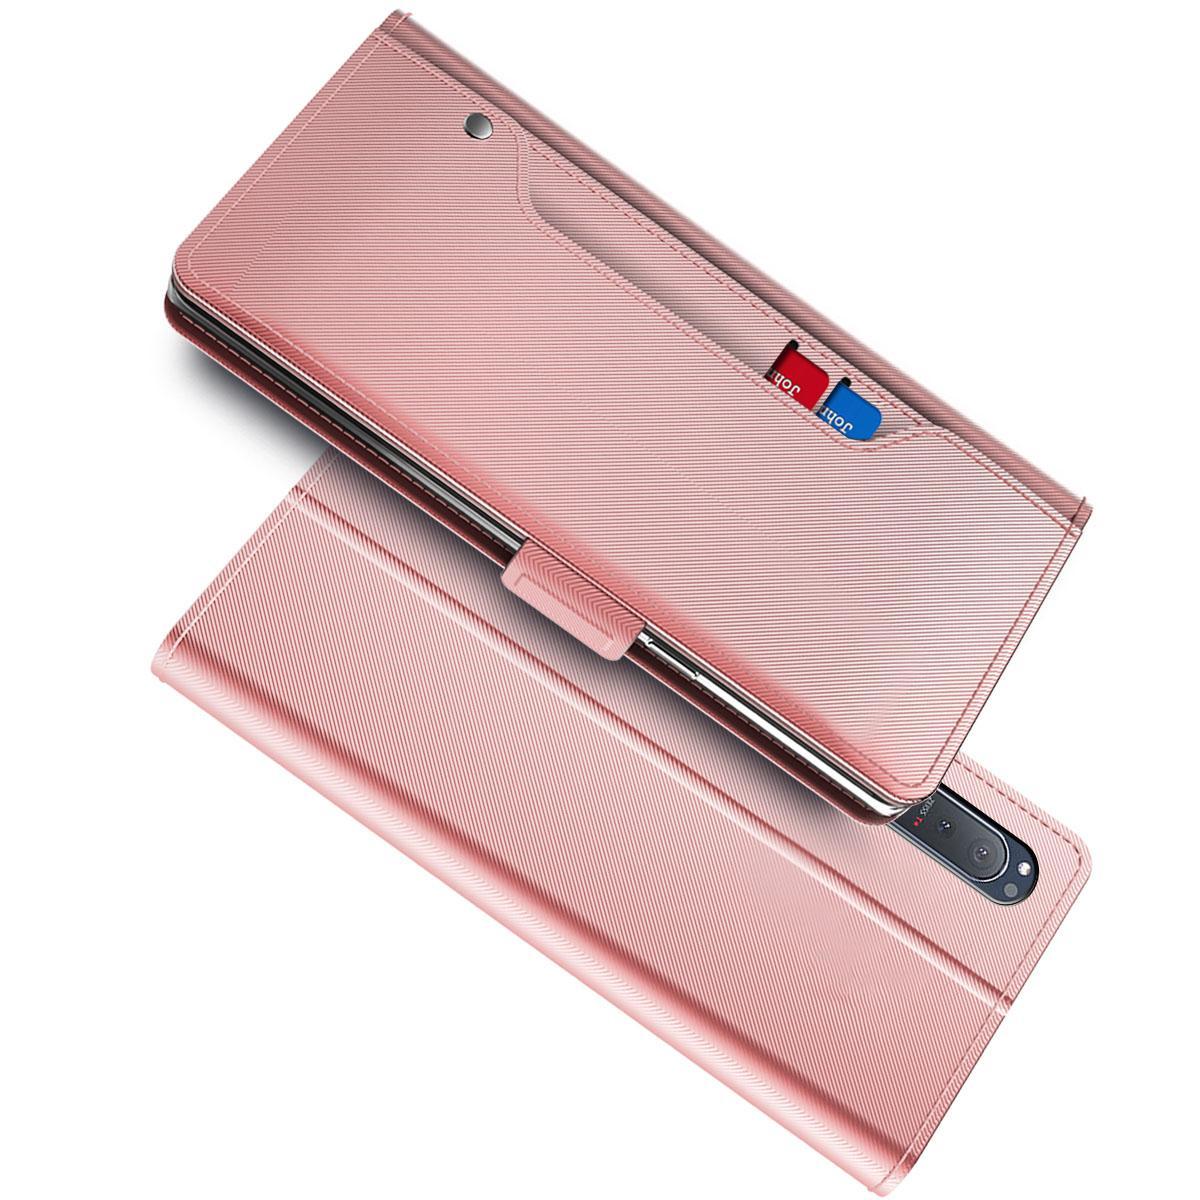 Lommebokdeksel Speil Sony Xperia 5 II Rosa Gull